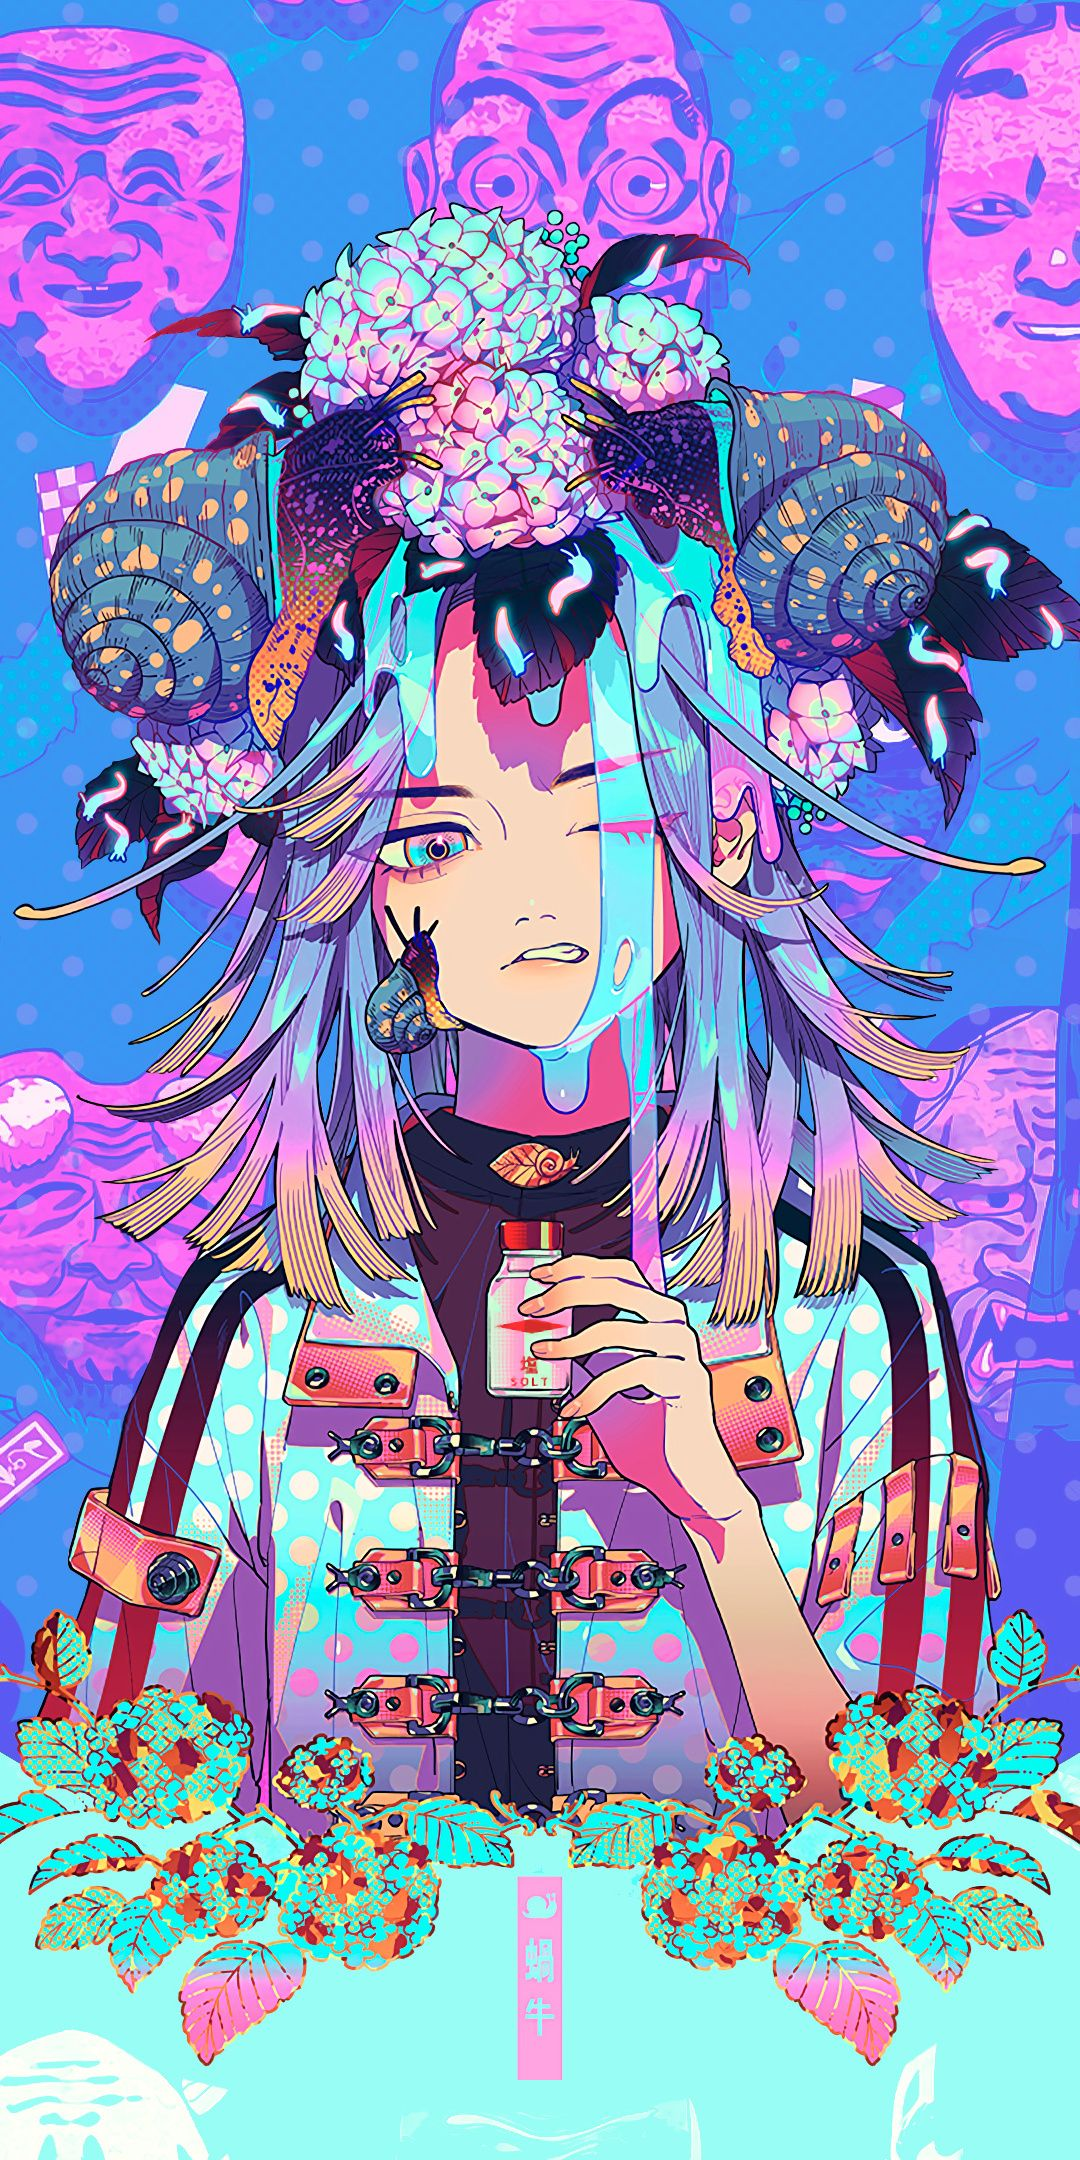 1080x2160 Anime Masks Glitch Art Aki Akane Art Wallpaper Anime Art Manga Art Kawaii Art